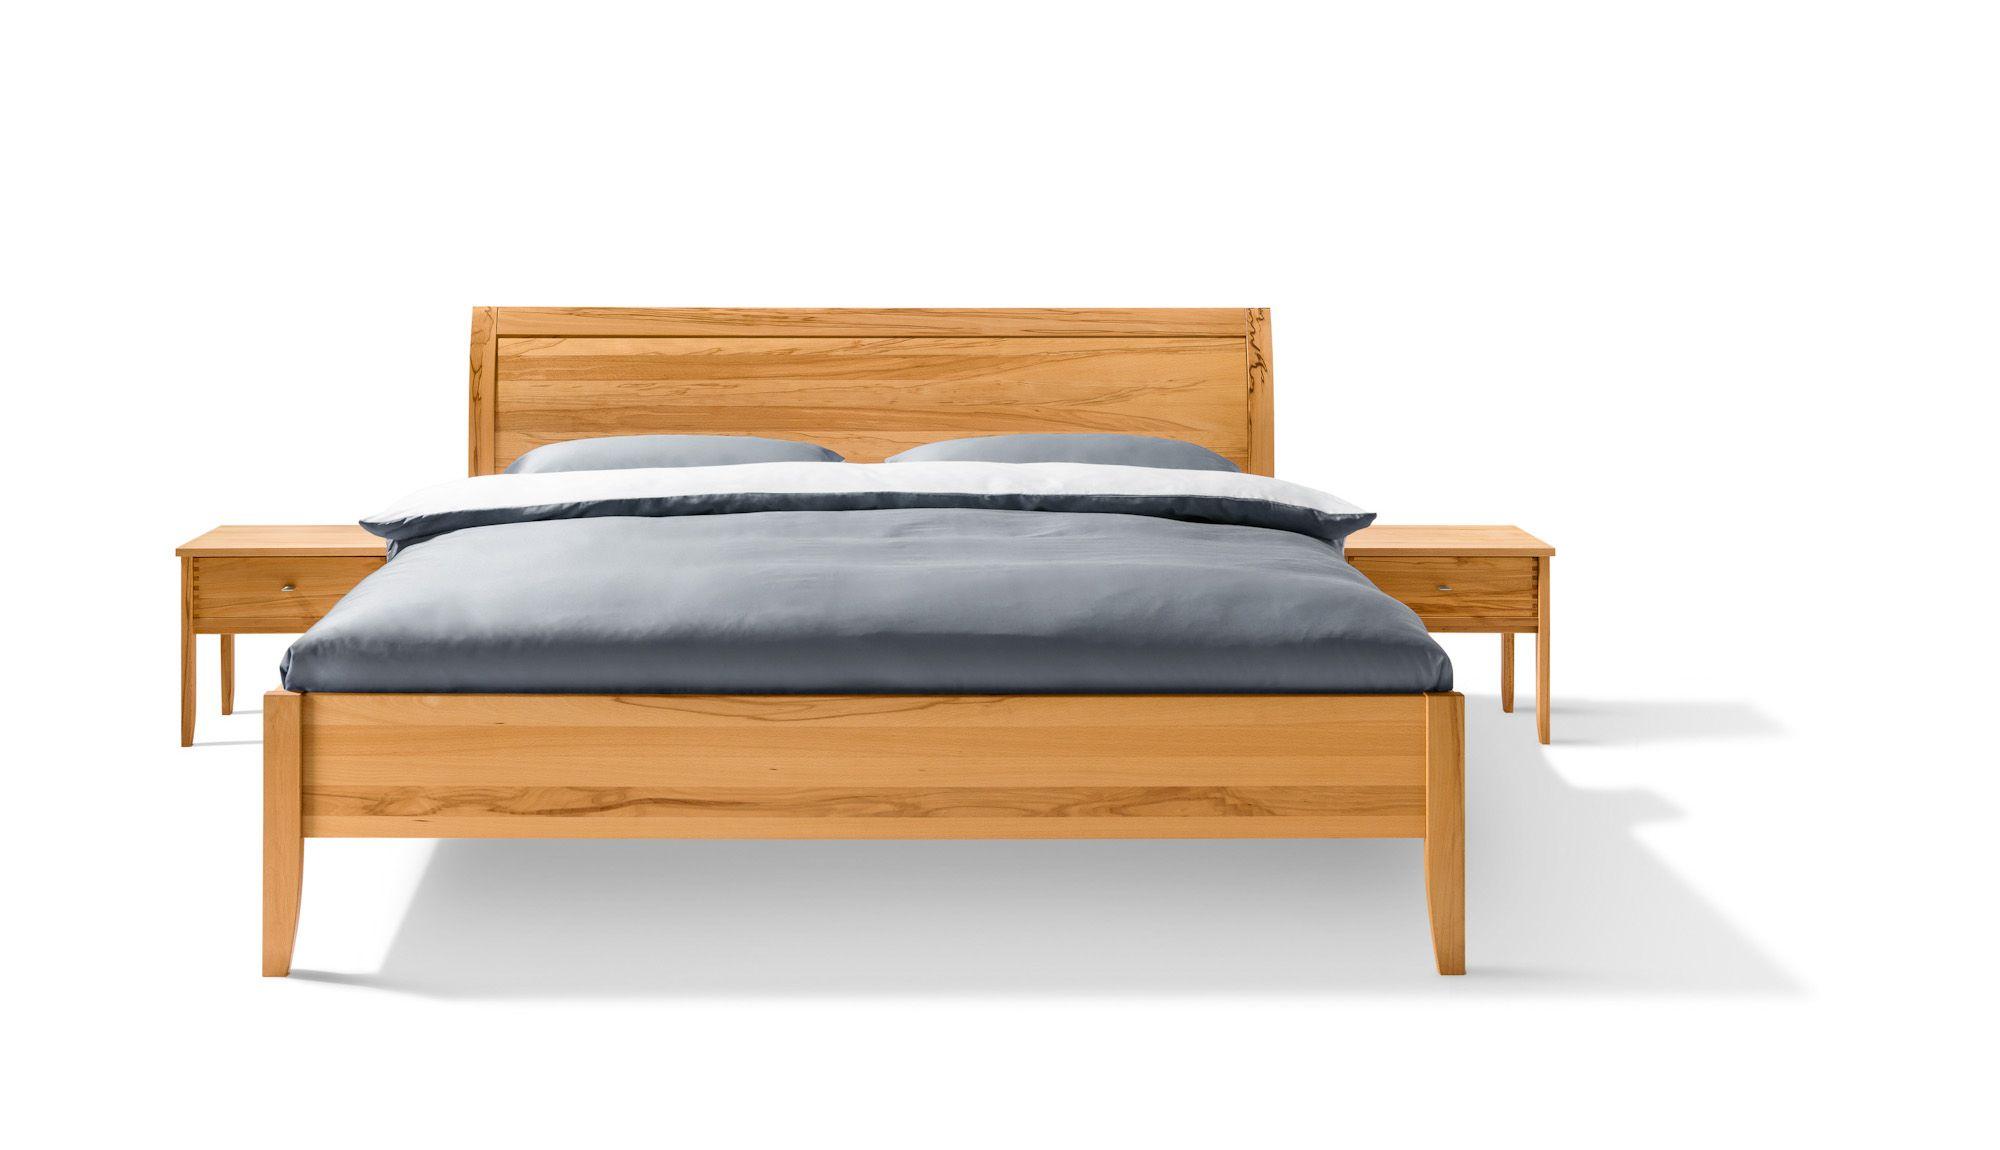 Bett Doppelbett Massivholz Kopfteil geschlossen oder